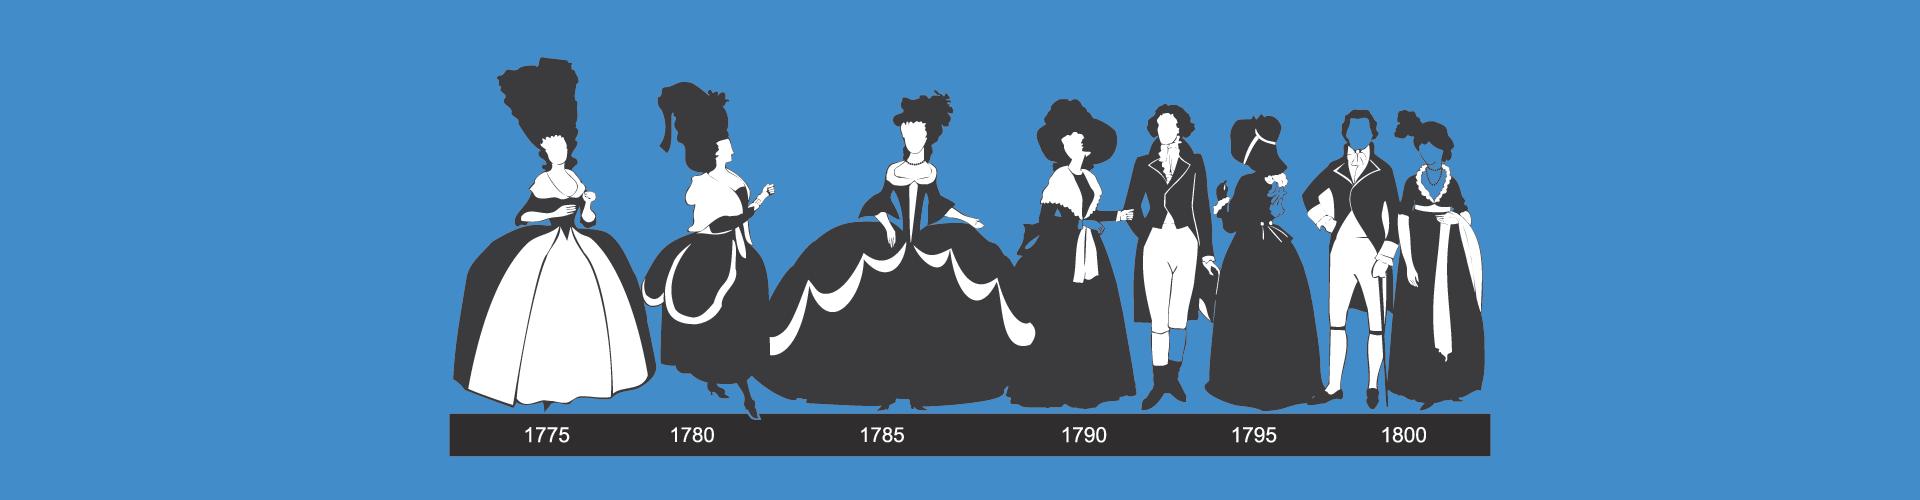 1775 to 1800